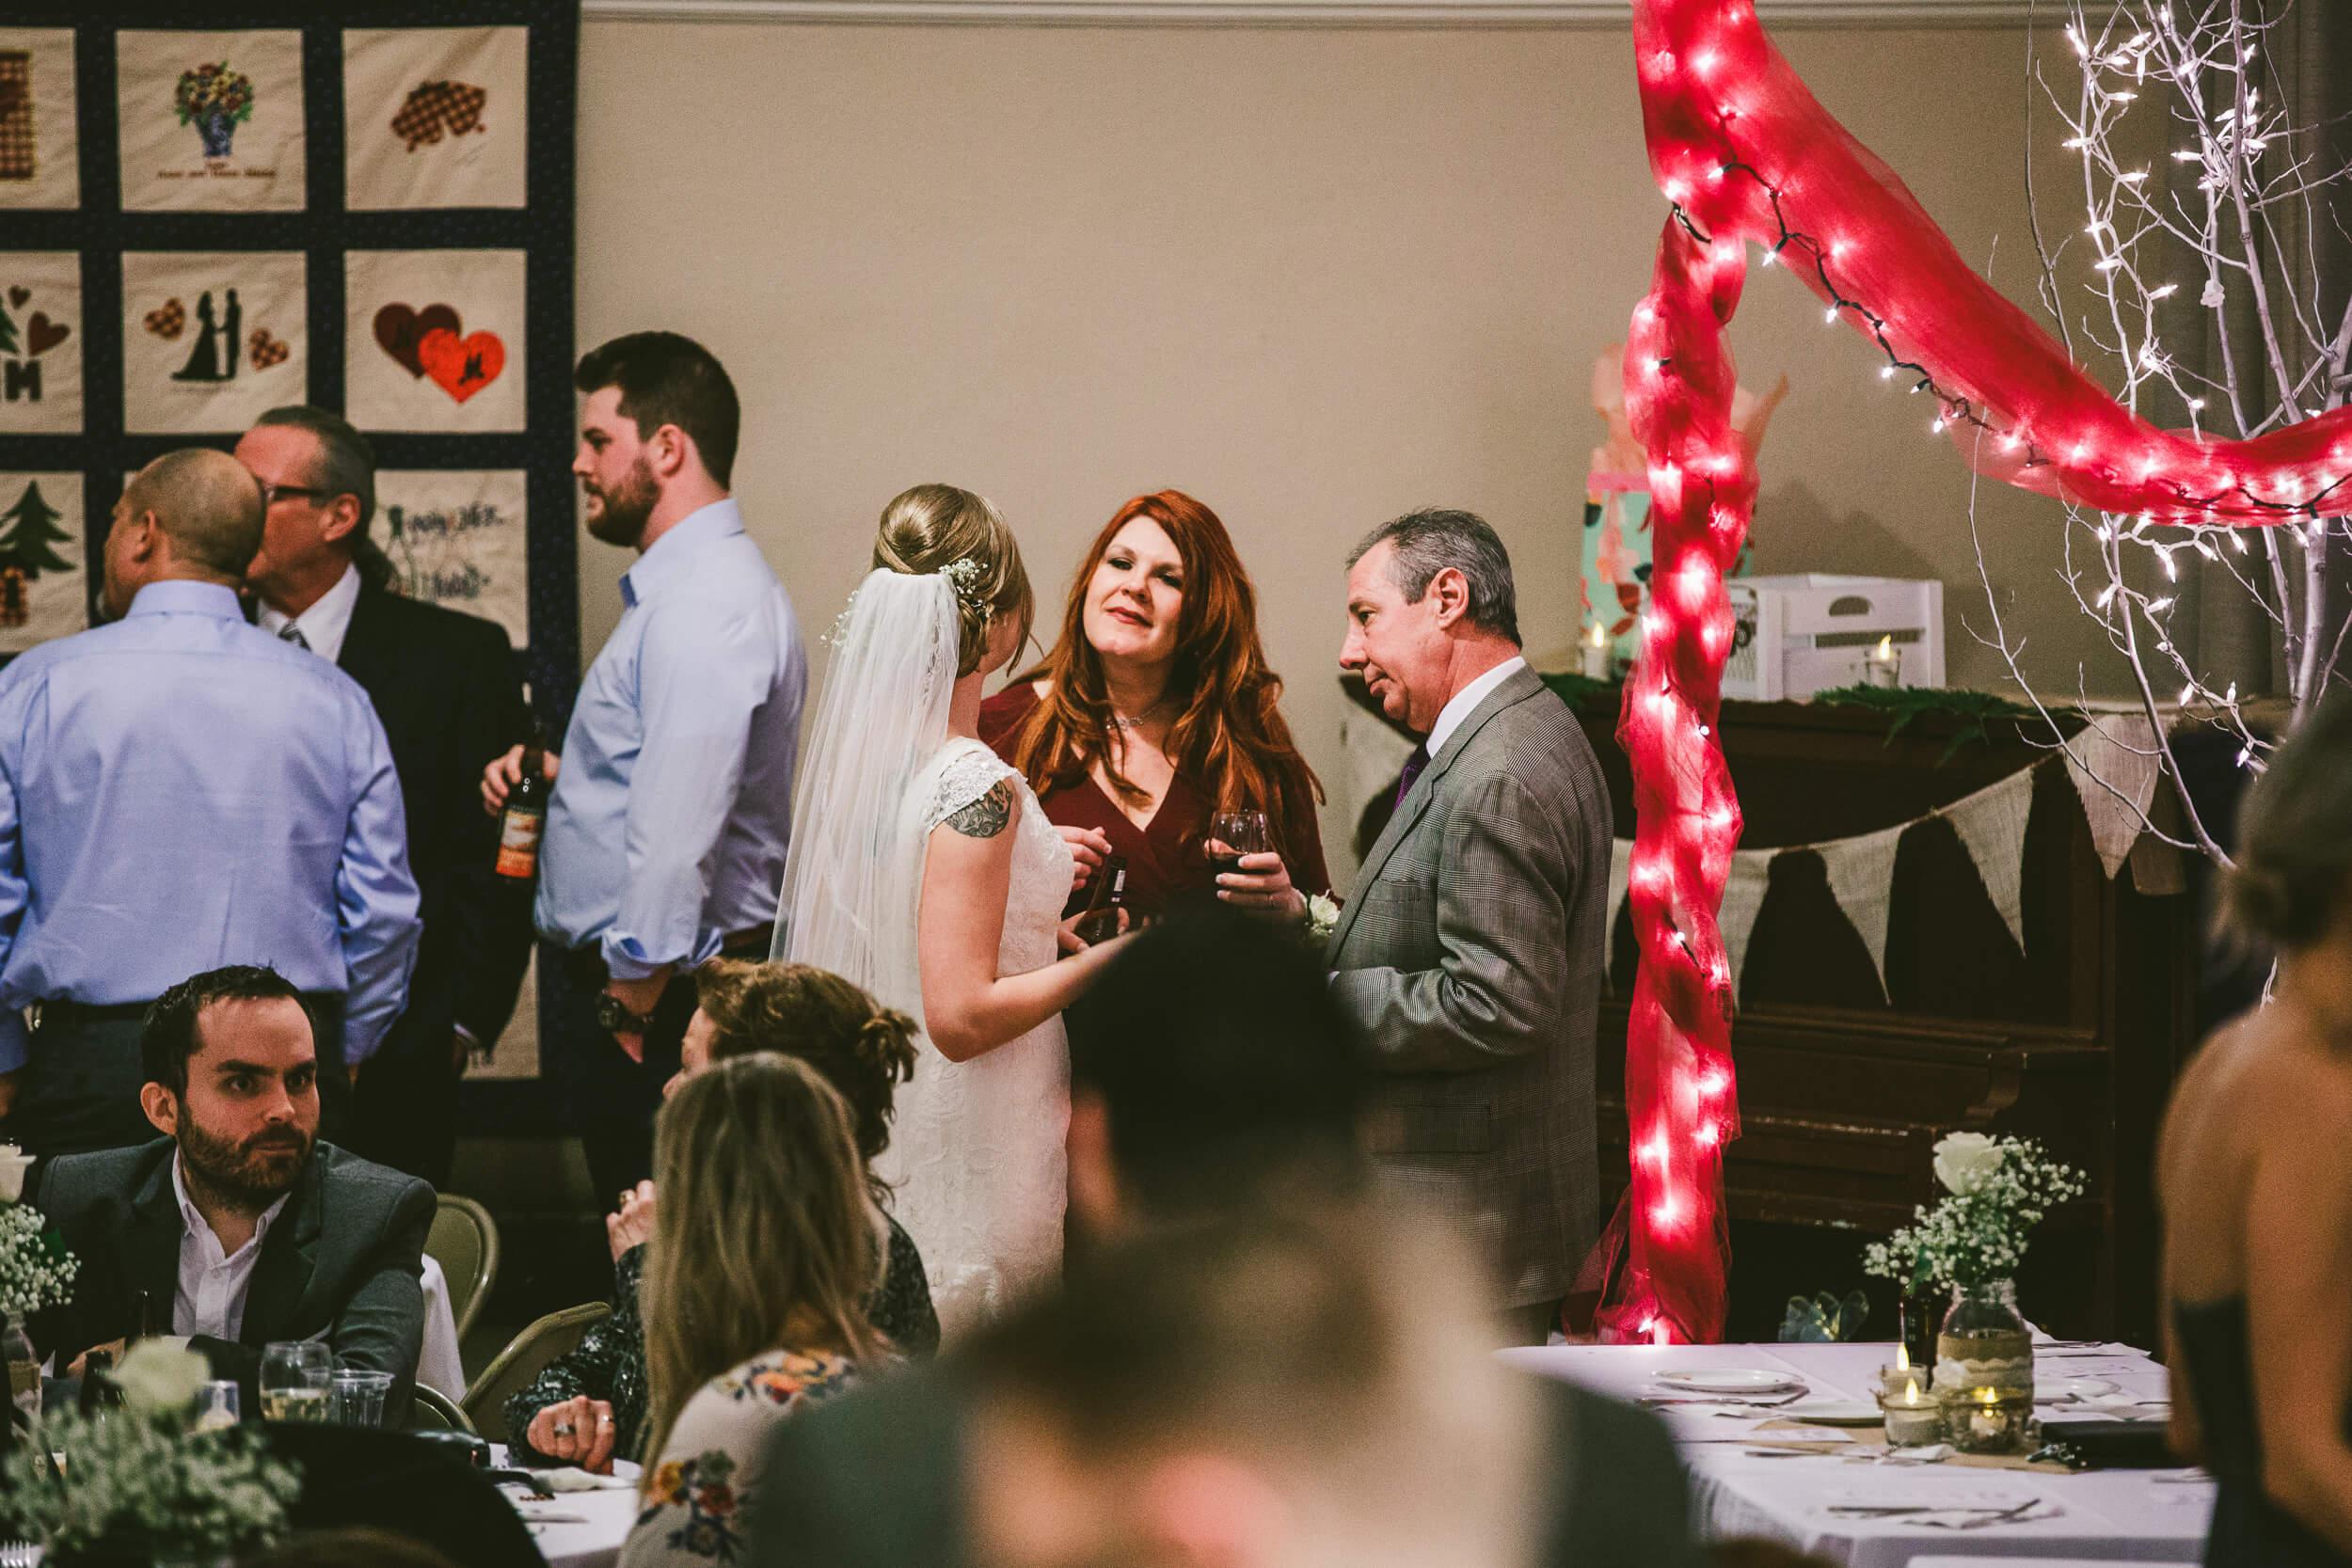 mukogawa winter wedding in spokane (214).jpg